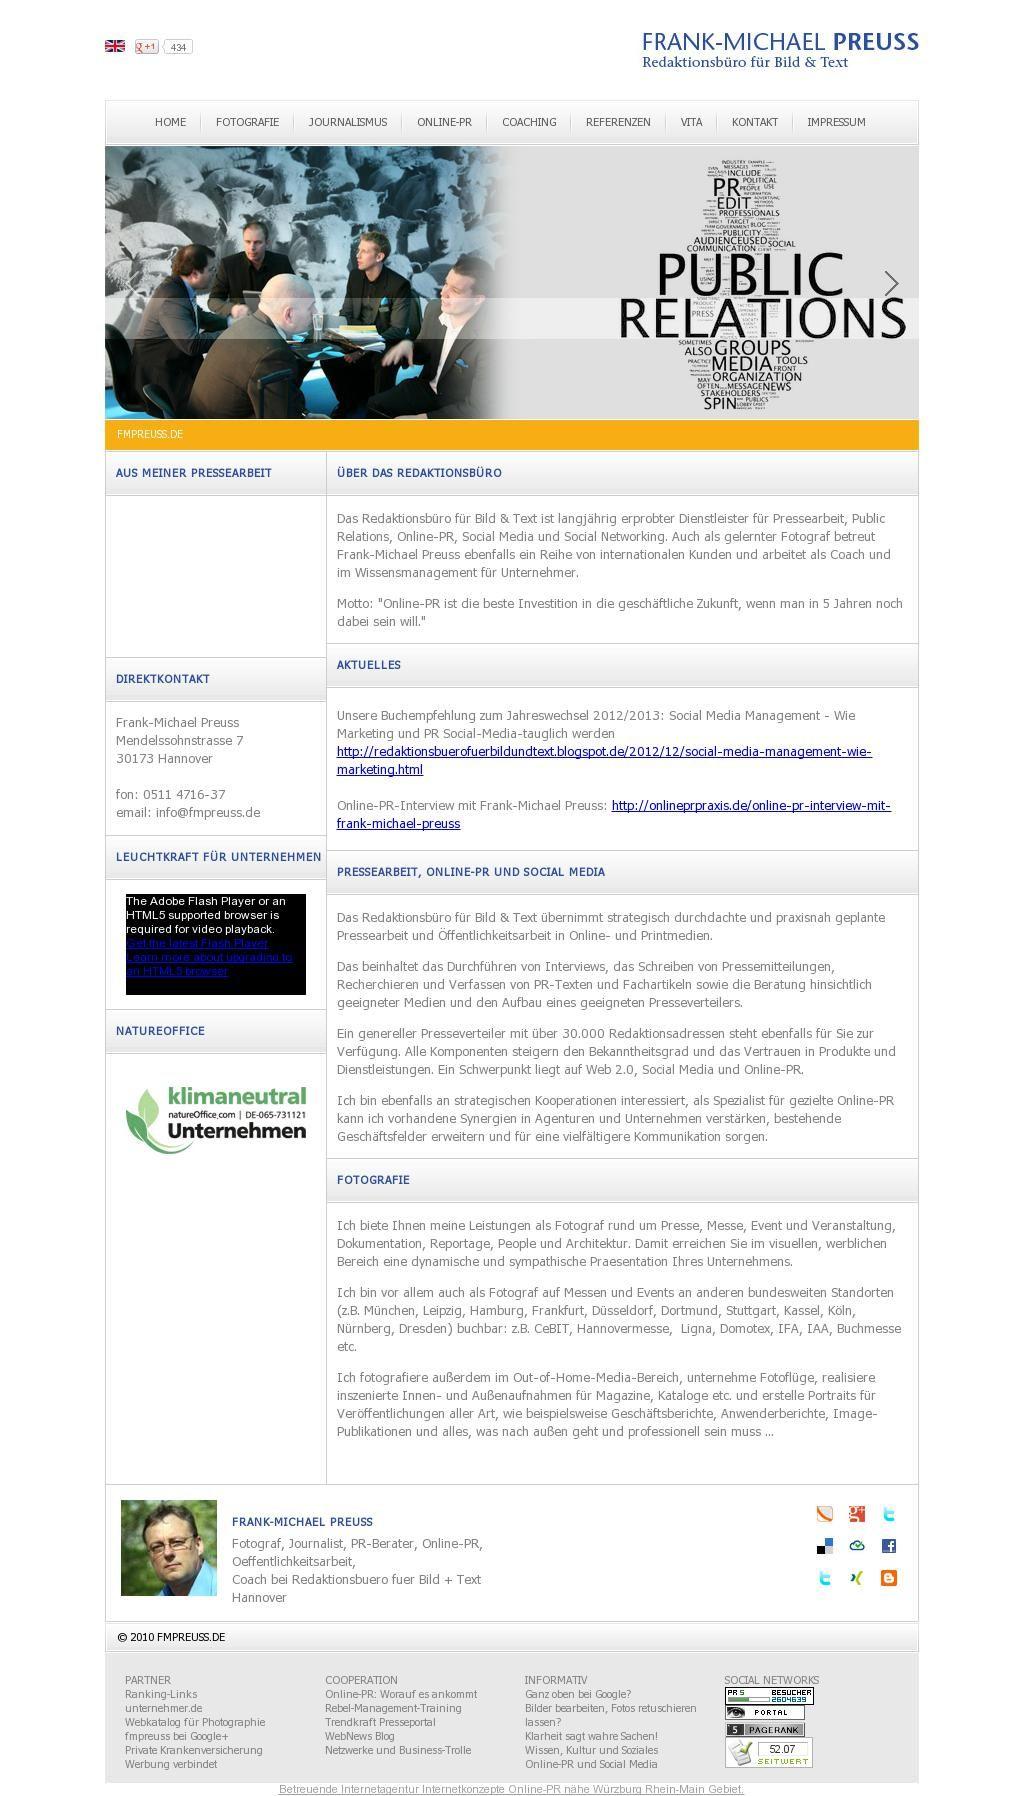 The website 'fmpreuss.de' courtesy of @Pinstamatic (http://pinstamatic.com)